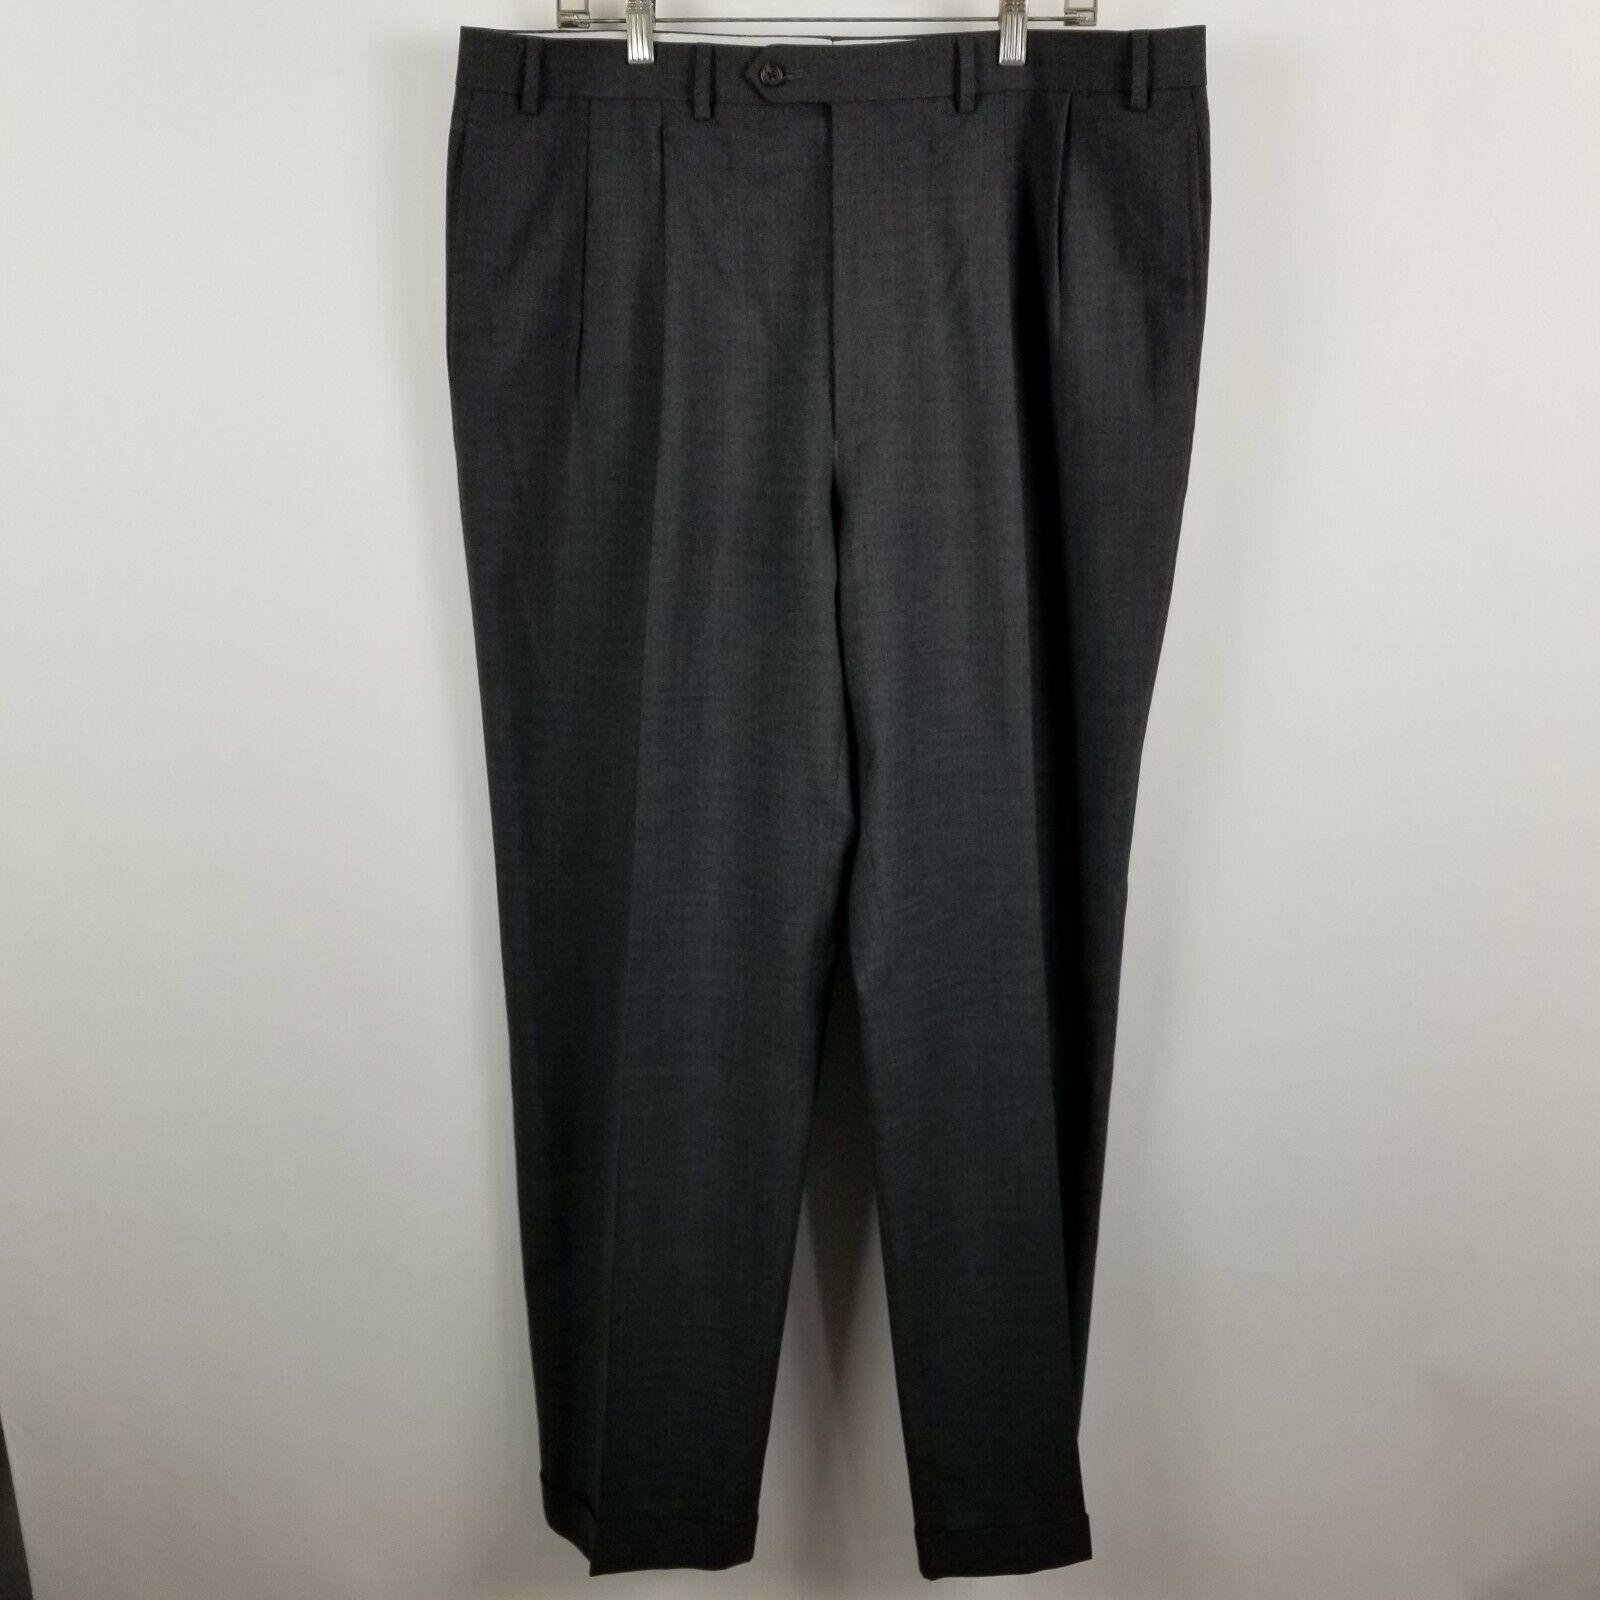 Lauren Ralph Lauren Total Comfort Mens Pleated Charcoal Dress Pants Size 38x32